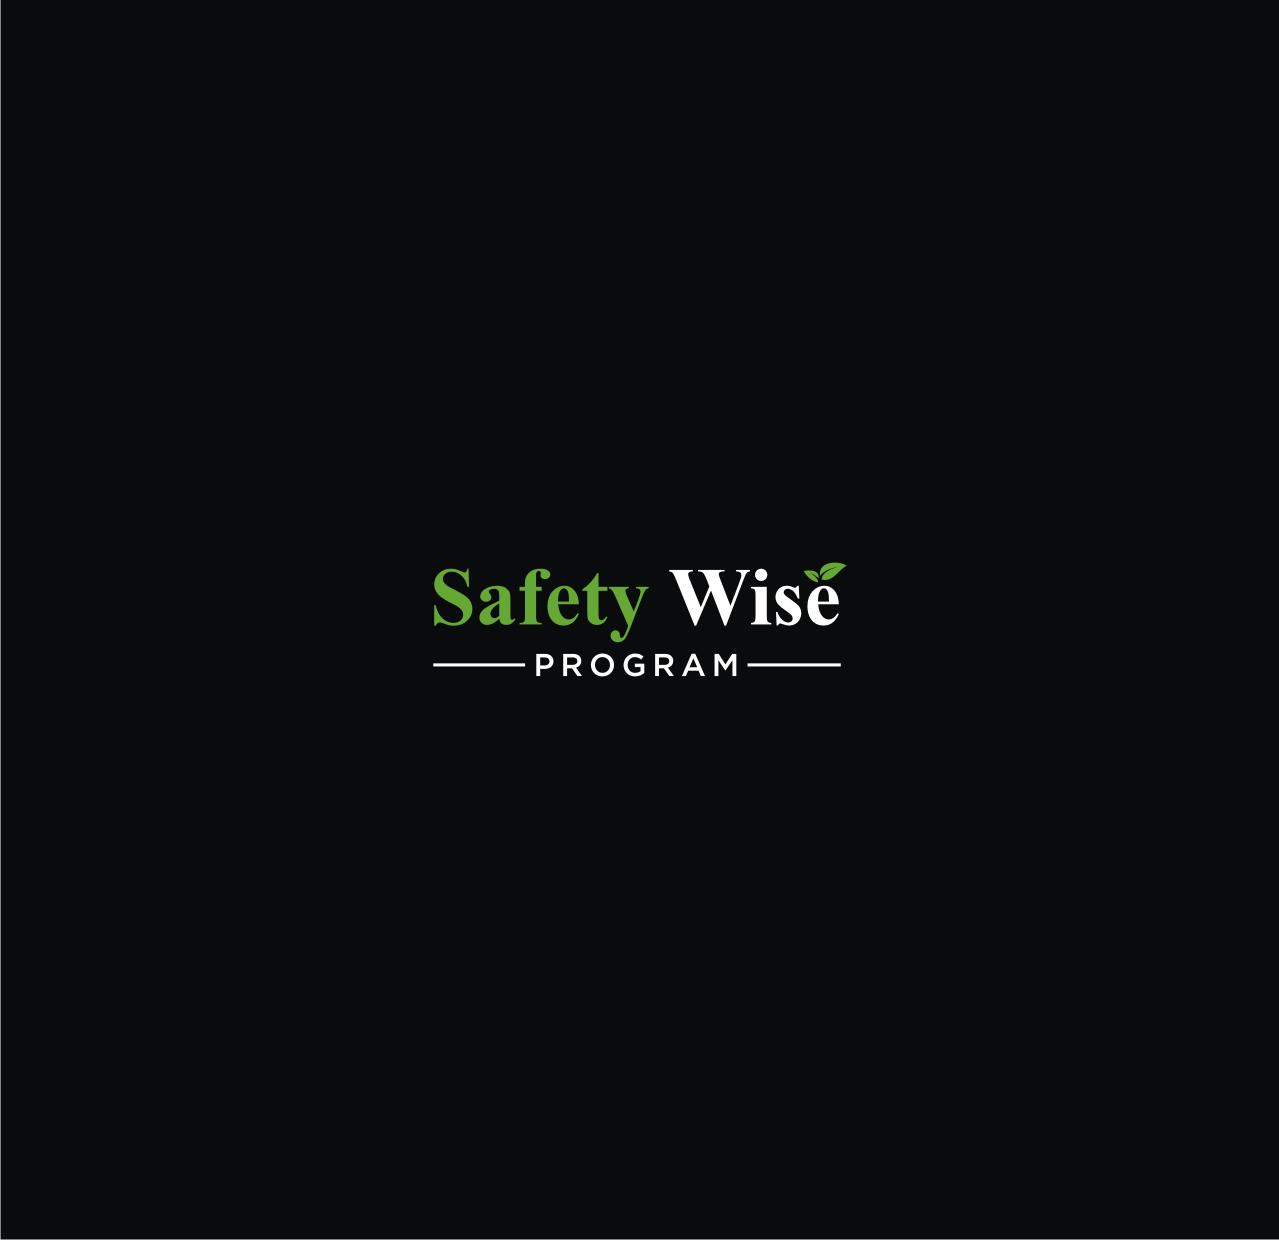 Logo Design by Sigitumarali Sigit - Entry No. 50 in the Logo Design Contest New Logo Design for Safety Wise Program.